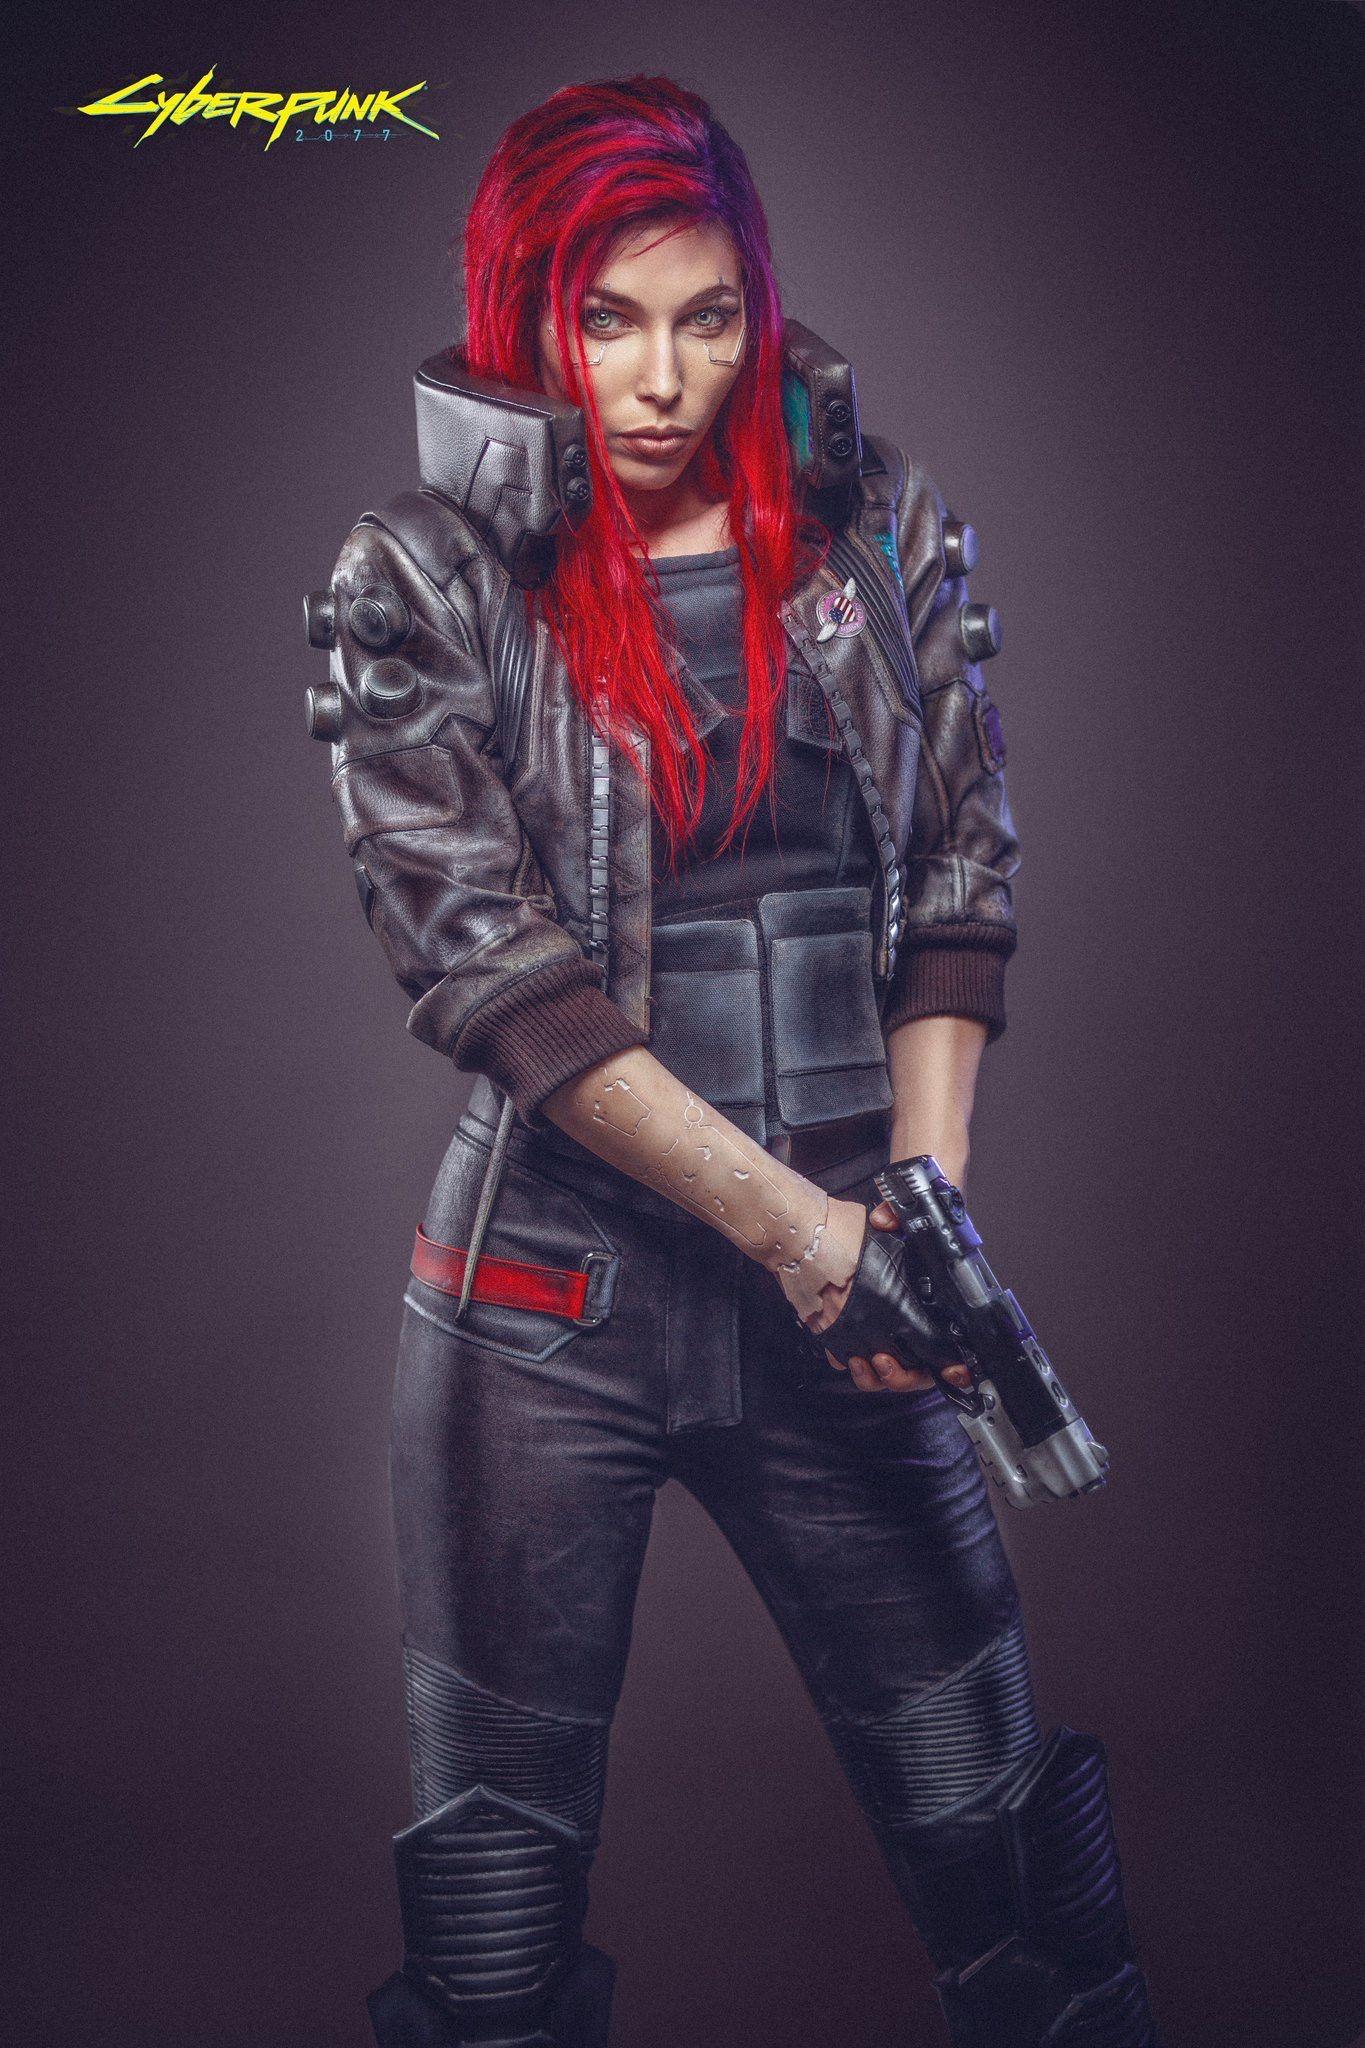 Pin by Natalie Tran on Cyberpunk   Cyberpunk 2077. Cyberpunk. Cyberpunk clothes